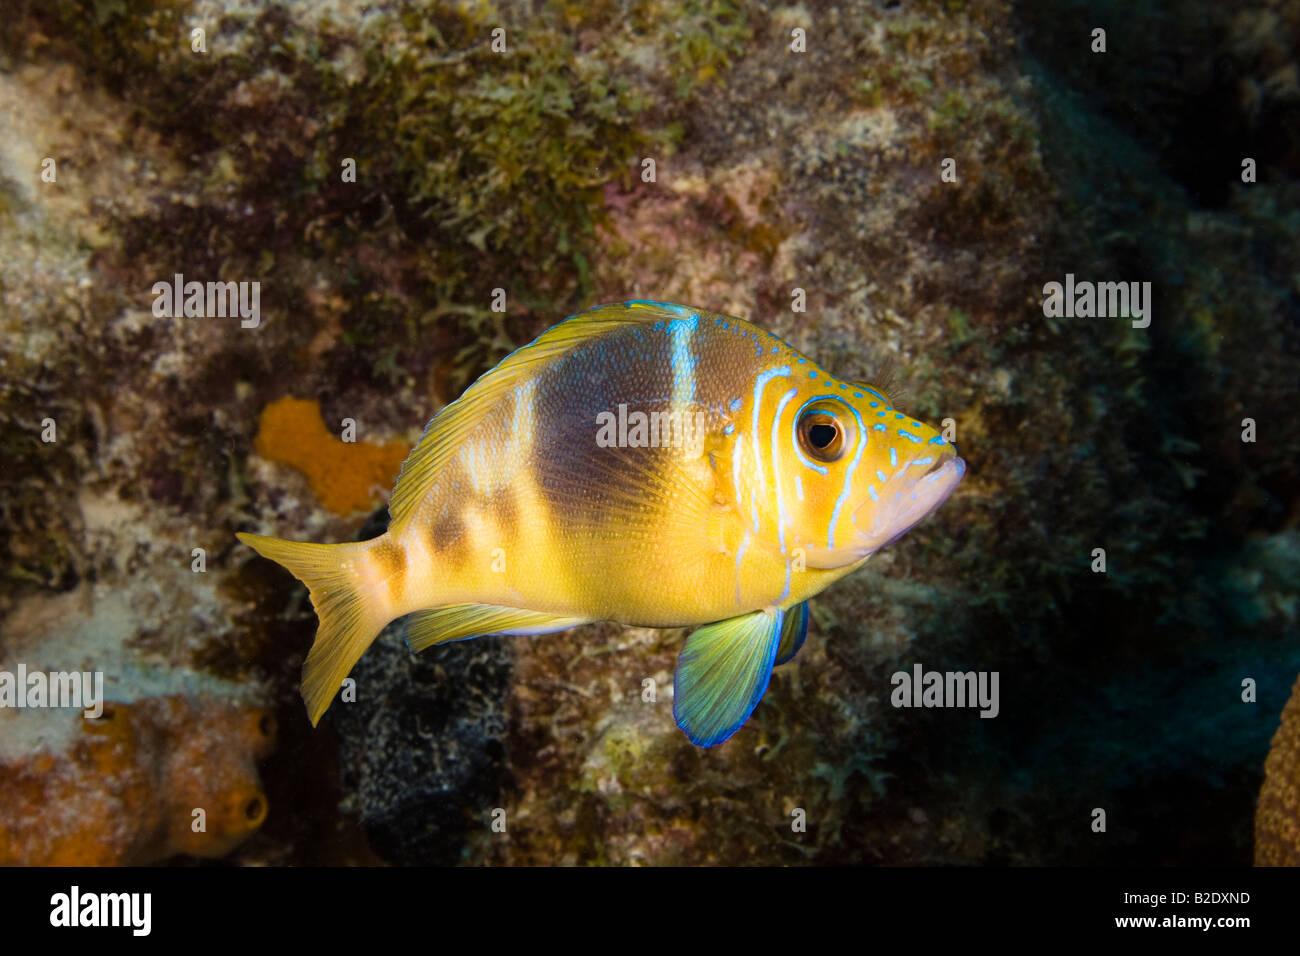 Barred hamlet, Hyploplectrus puella, Bonaire, Netherlands Antilles, Caribbean. - Stock Image